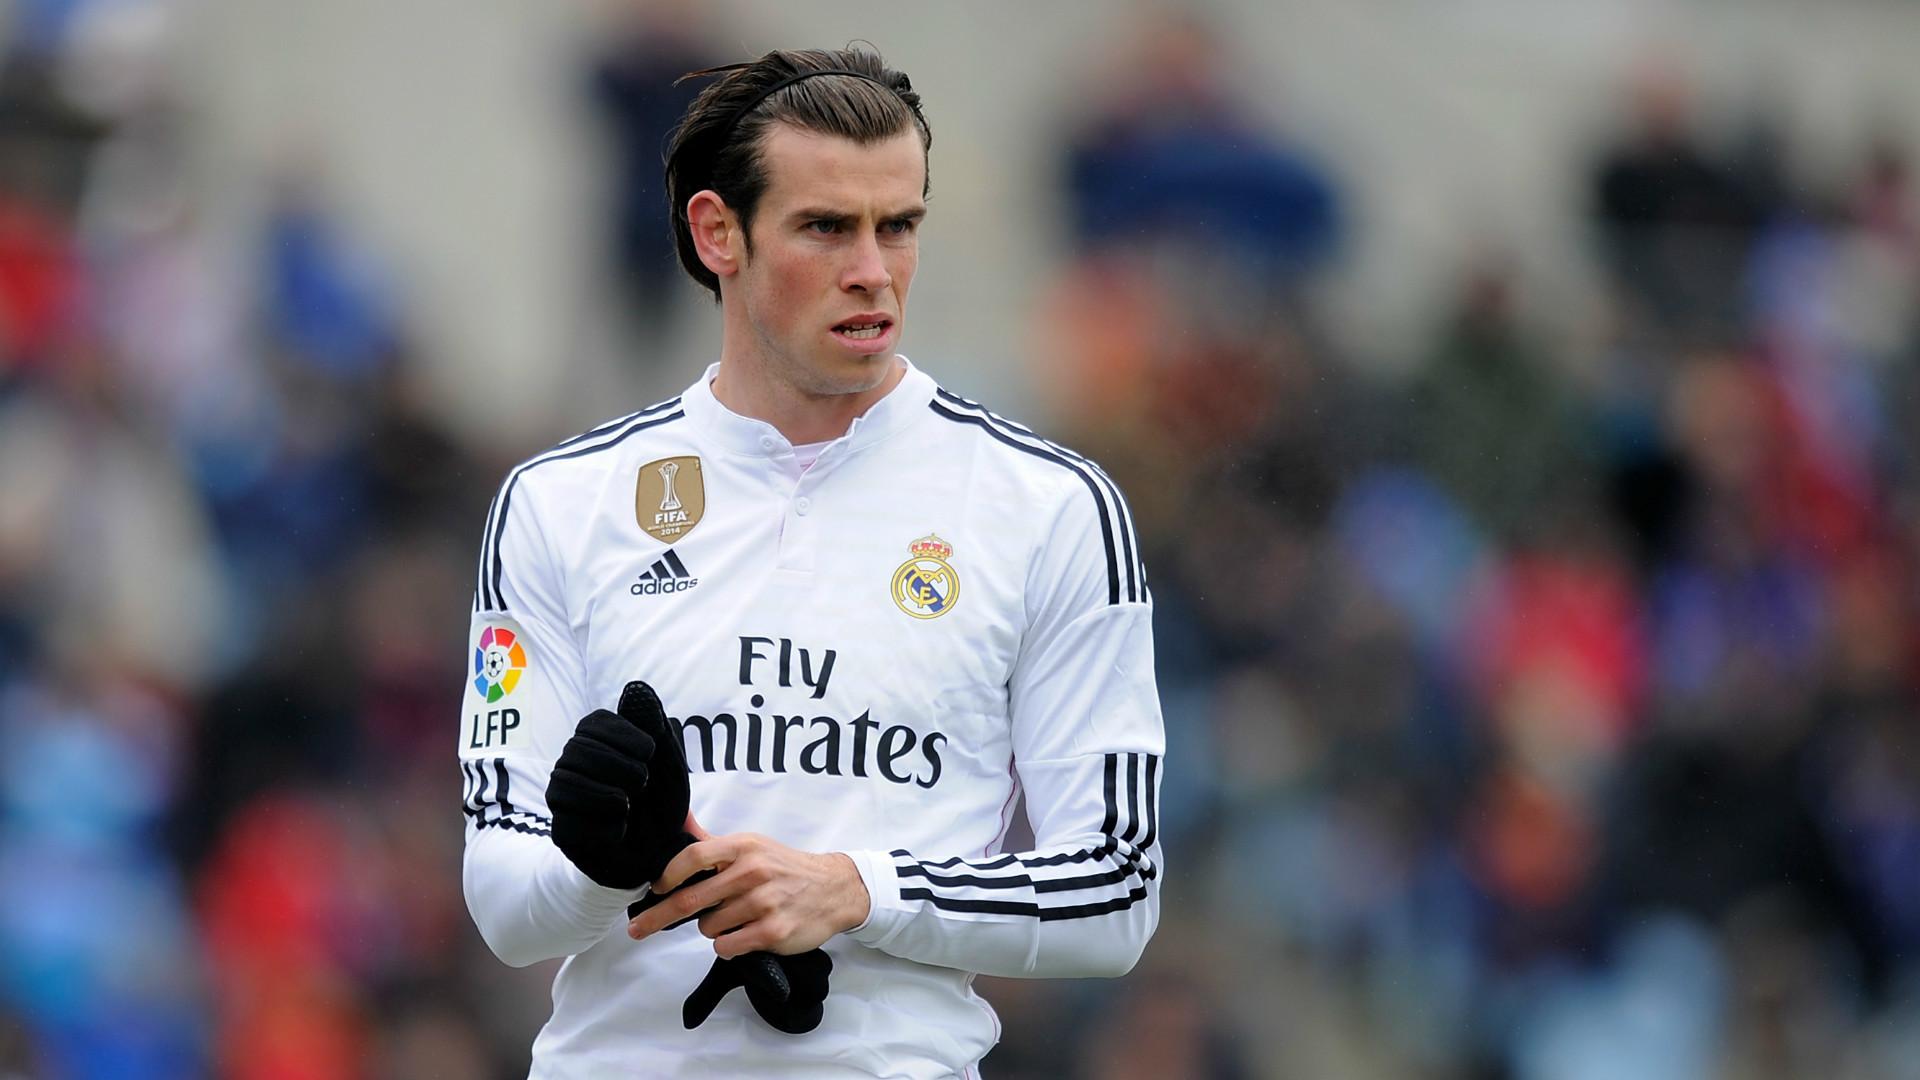 Wallpaper Real Madrid Hd Gareth Bale Wallpaper 2018 Hd 79 Images